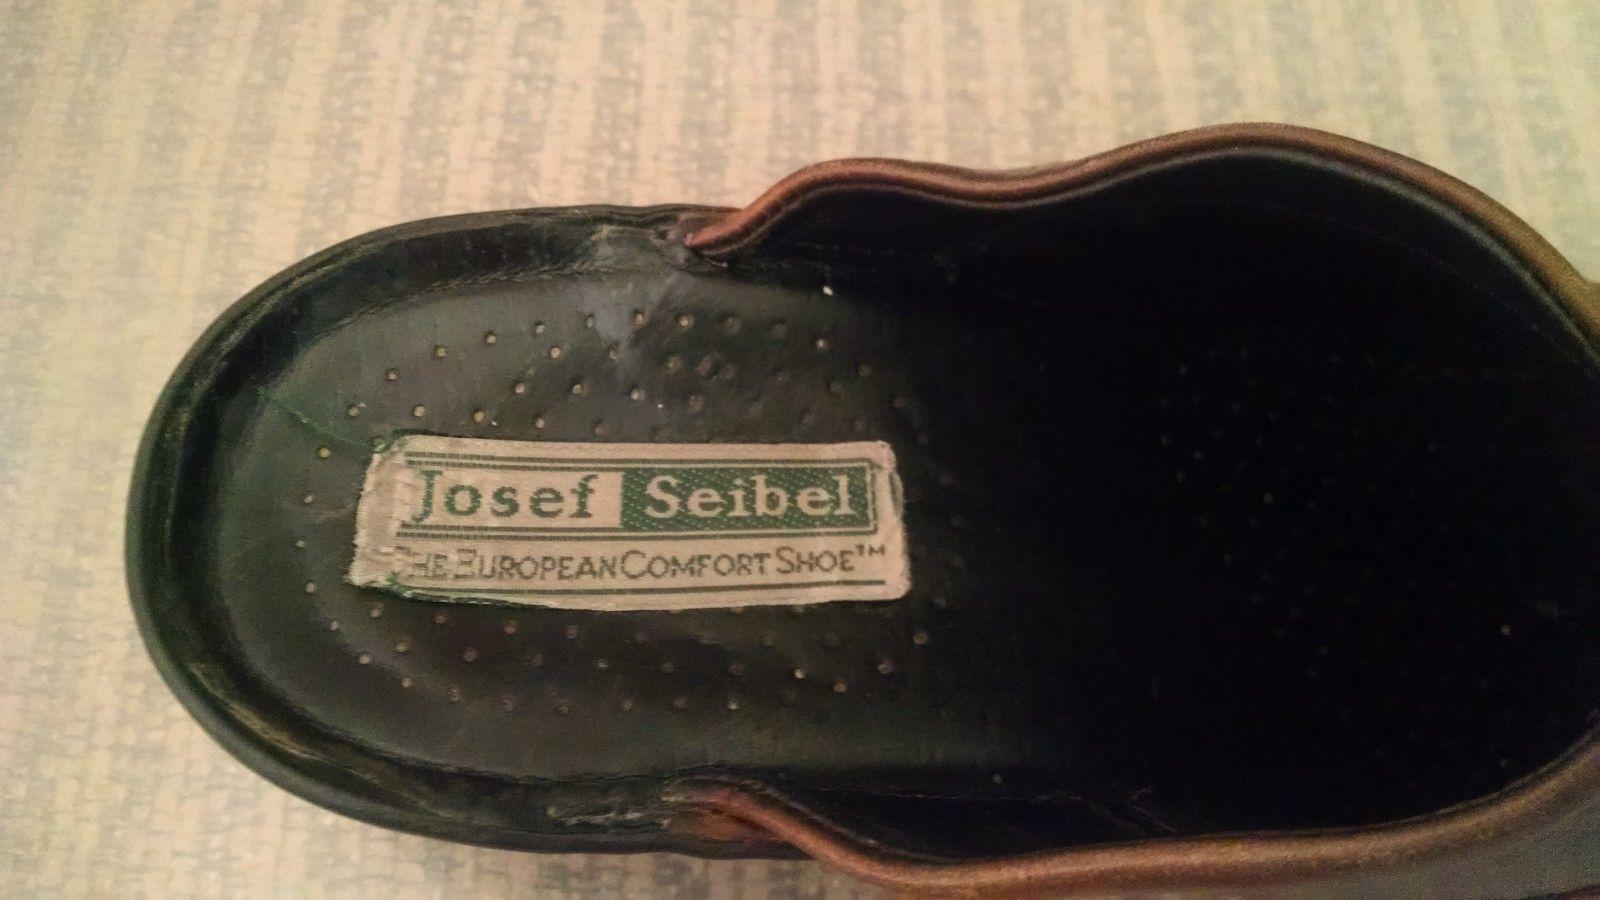 Josef Seibel Womens Clogs 38 EU 7 - 7.5 US Mules Slip On European Comfort Shoe image 3